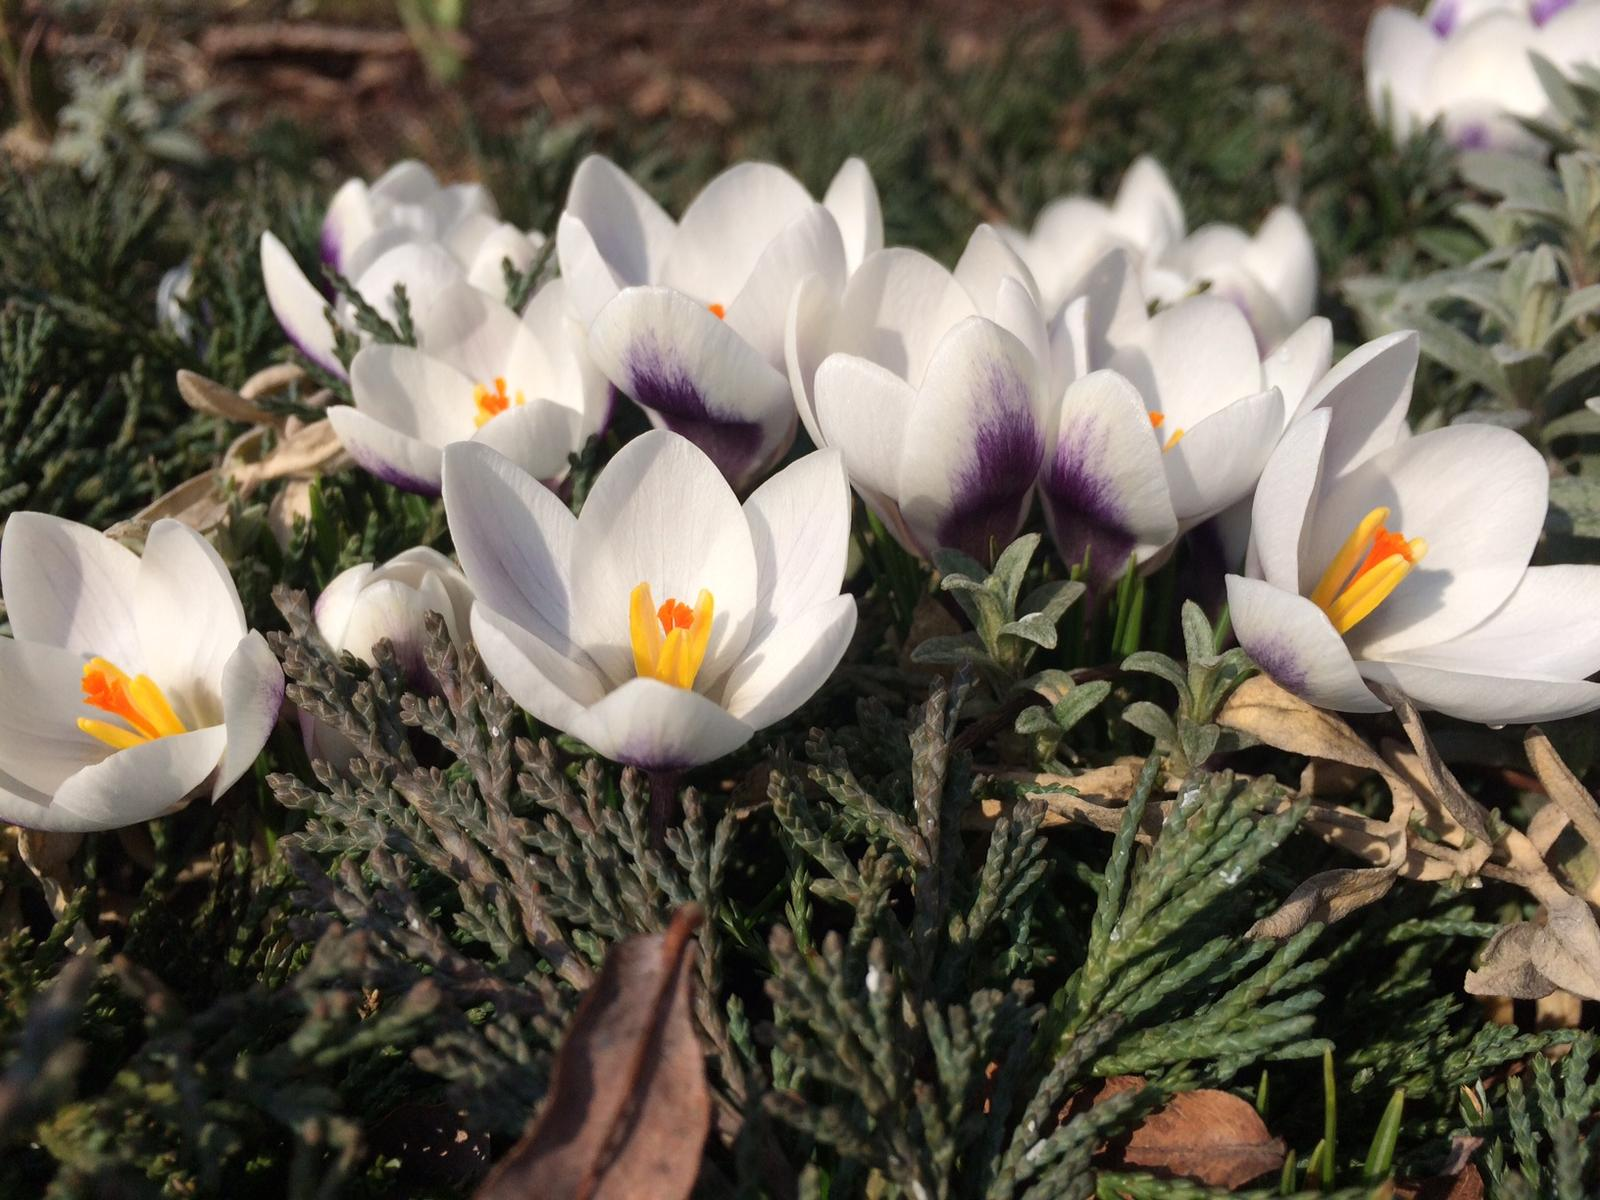 Zahrada 2018 - krokusy - moji oblíbení poslové jara